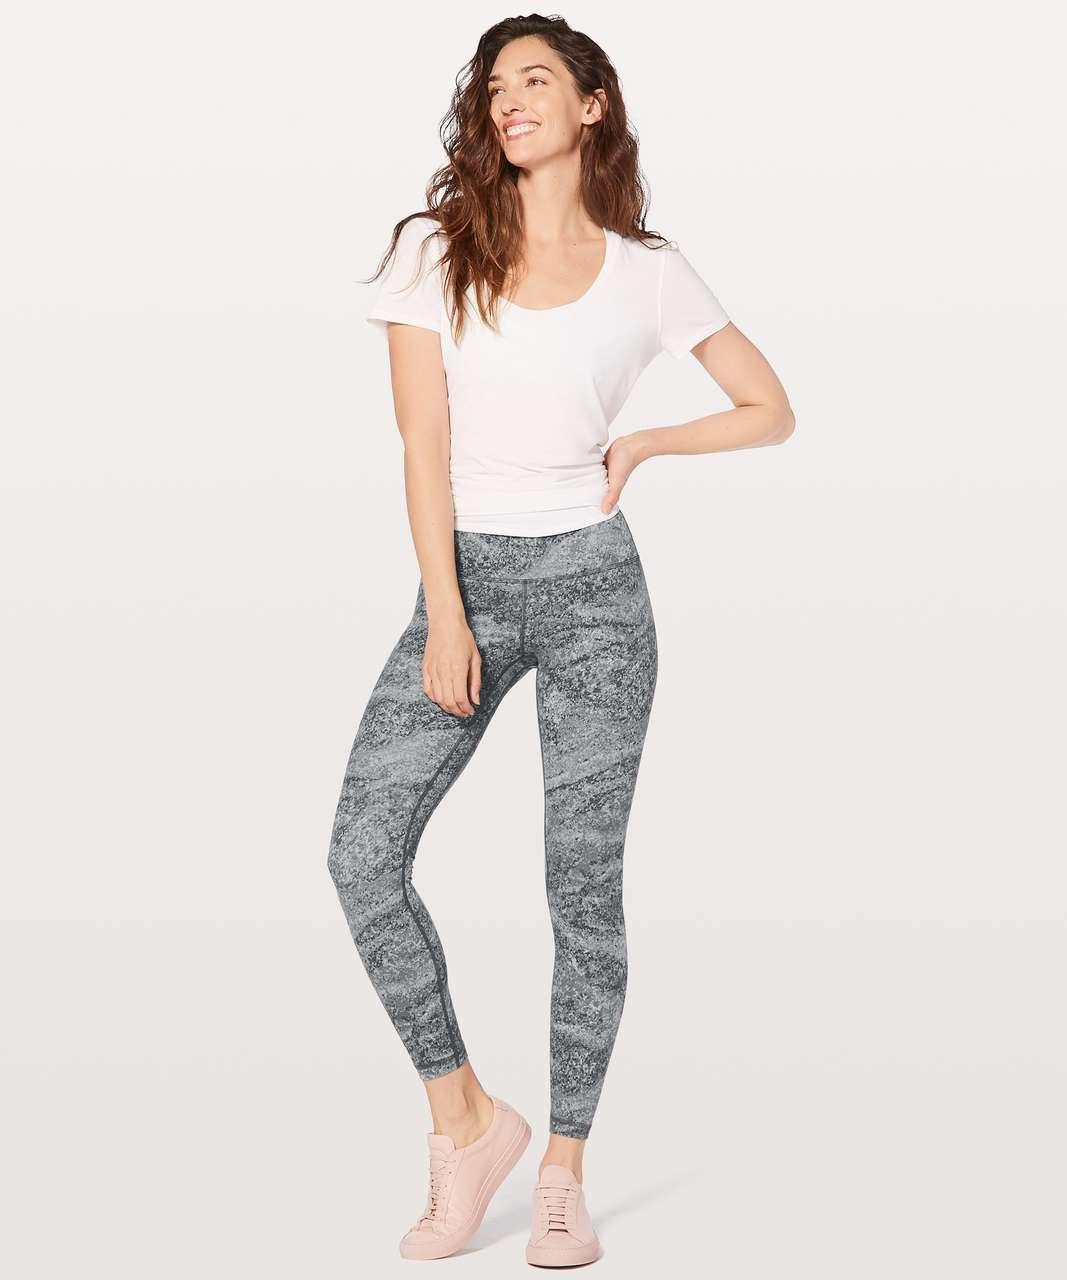 "Lululemon Align Pant Full Length 28"" - Area Ice Grey"